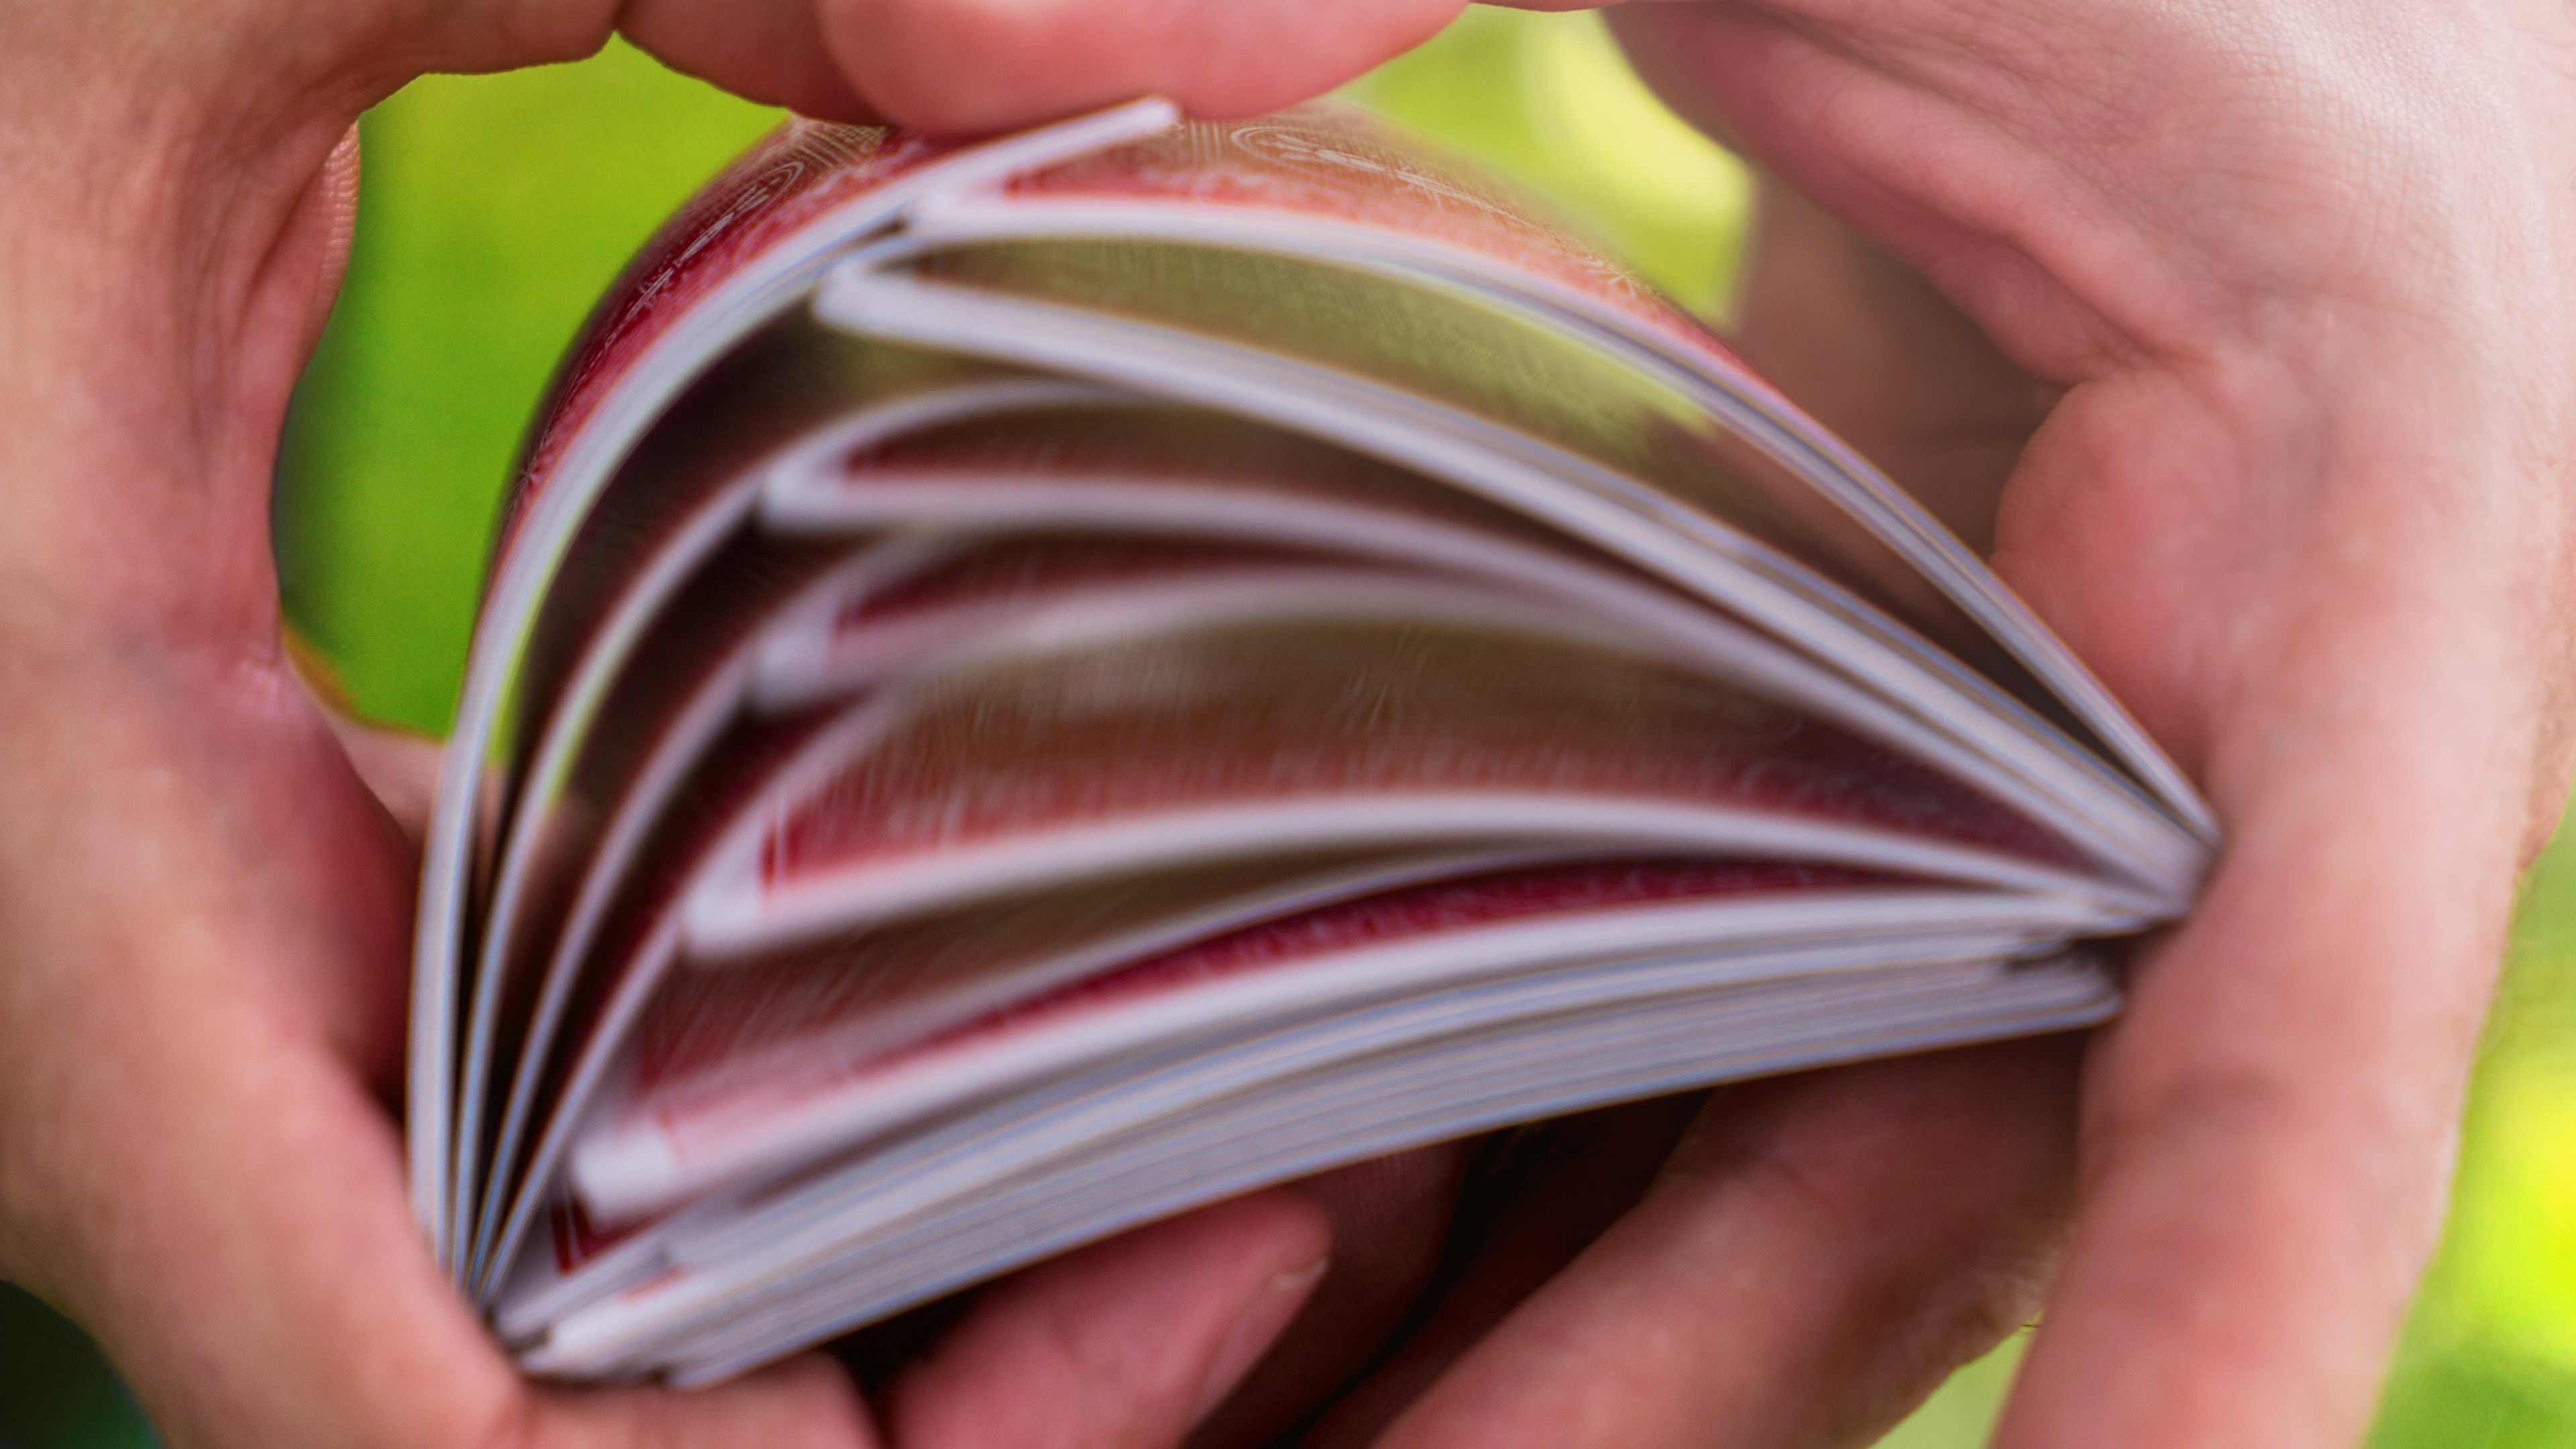 Cómo barajar las cartas de manera profesional Mezcla americana Riffle shuffle